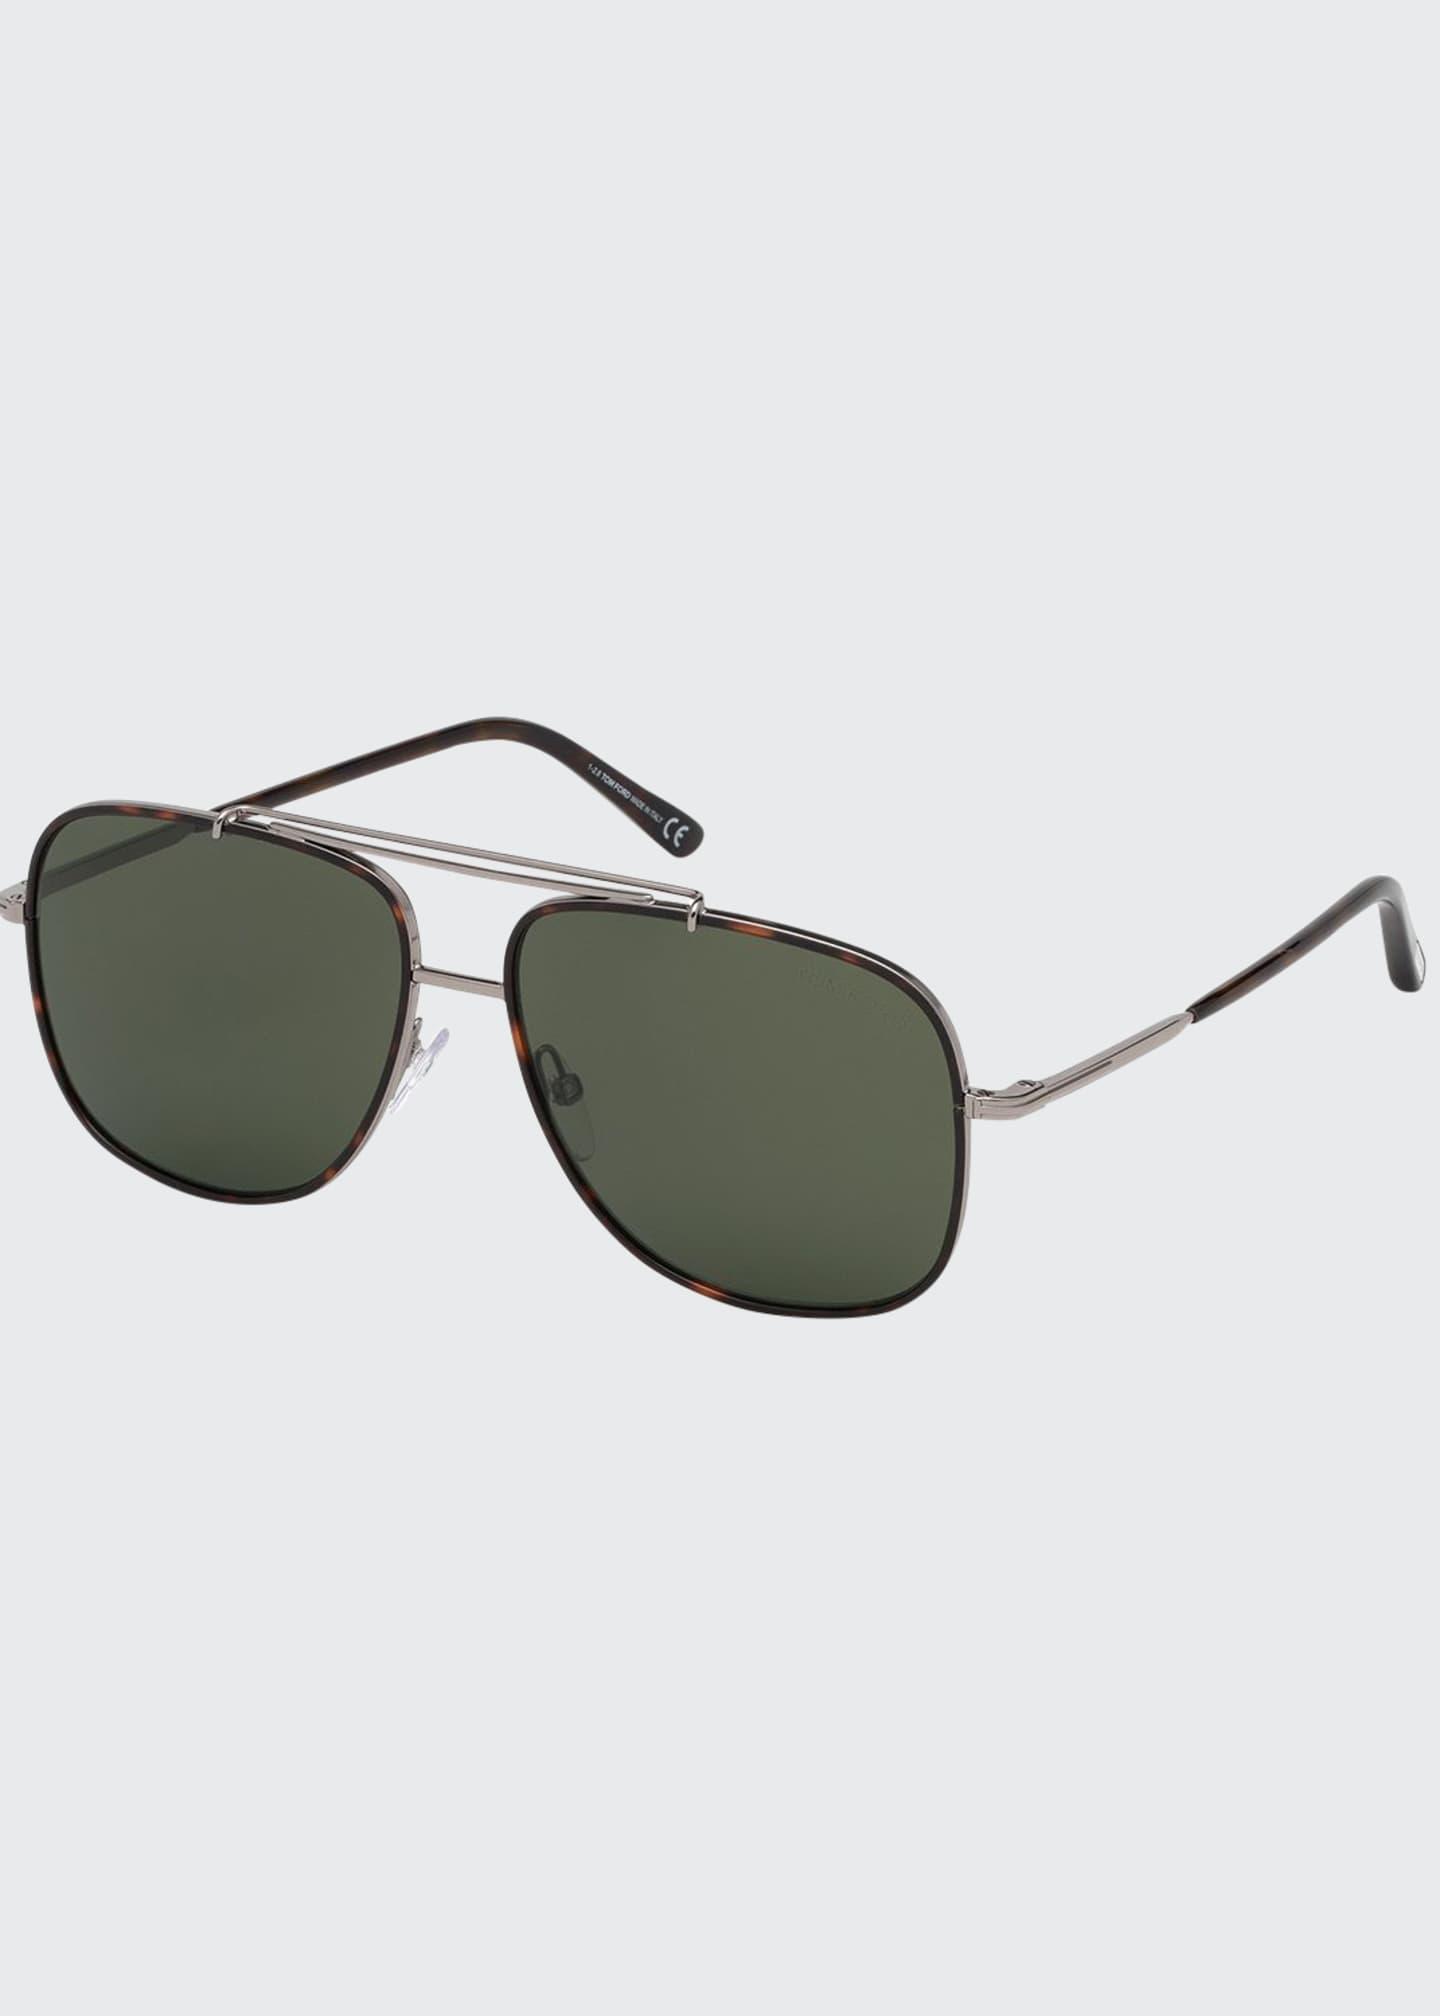 TOM FORD Men's Ruthenium Metal Aviator Sunglasses